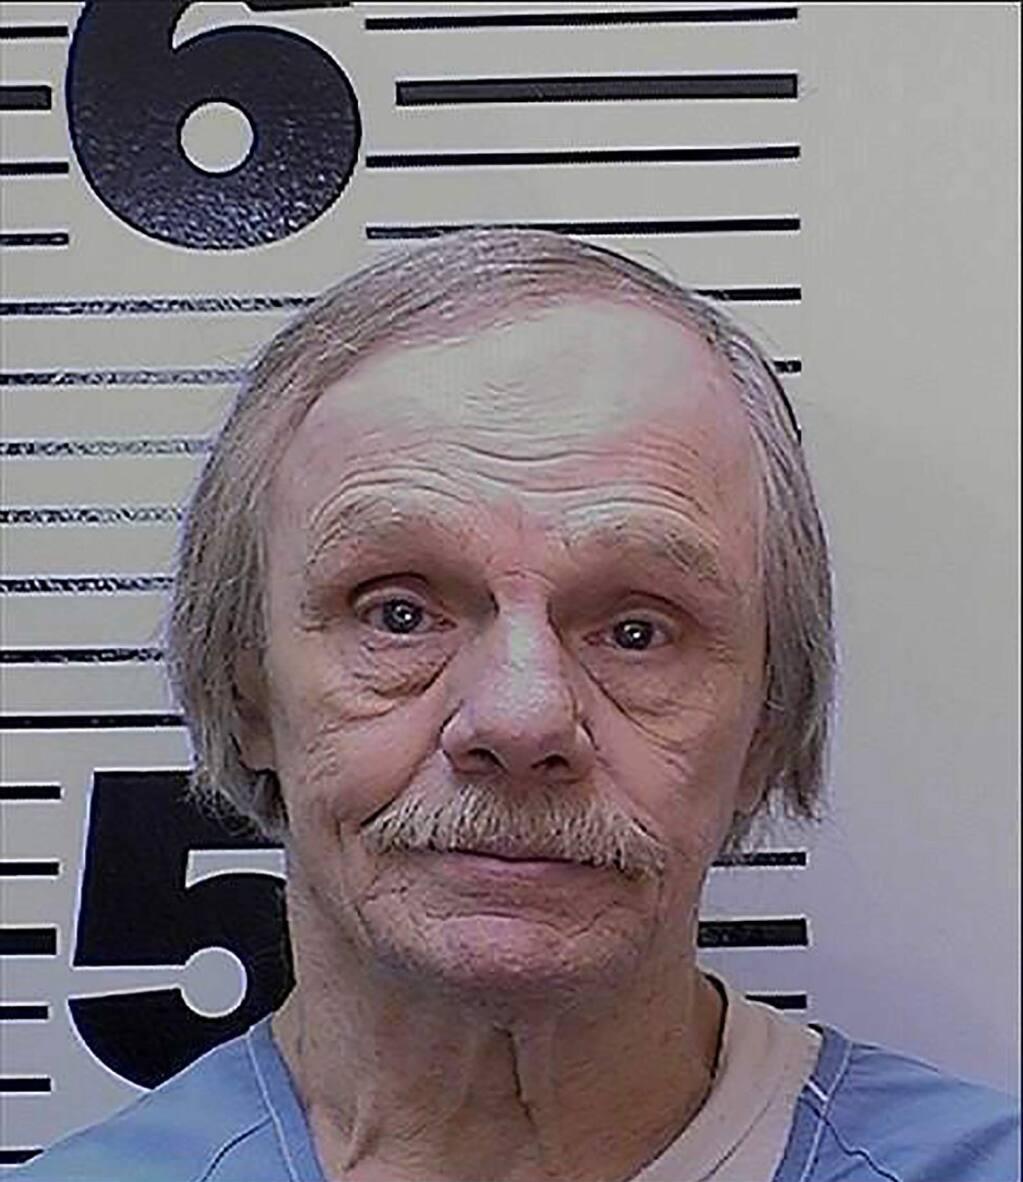 Tool Box Killer' Lawrence Bittaker dies in prison at 20